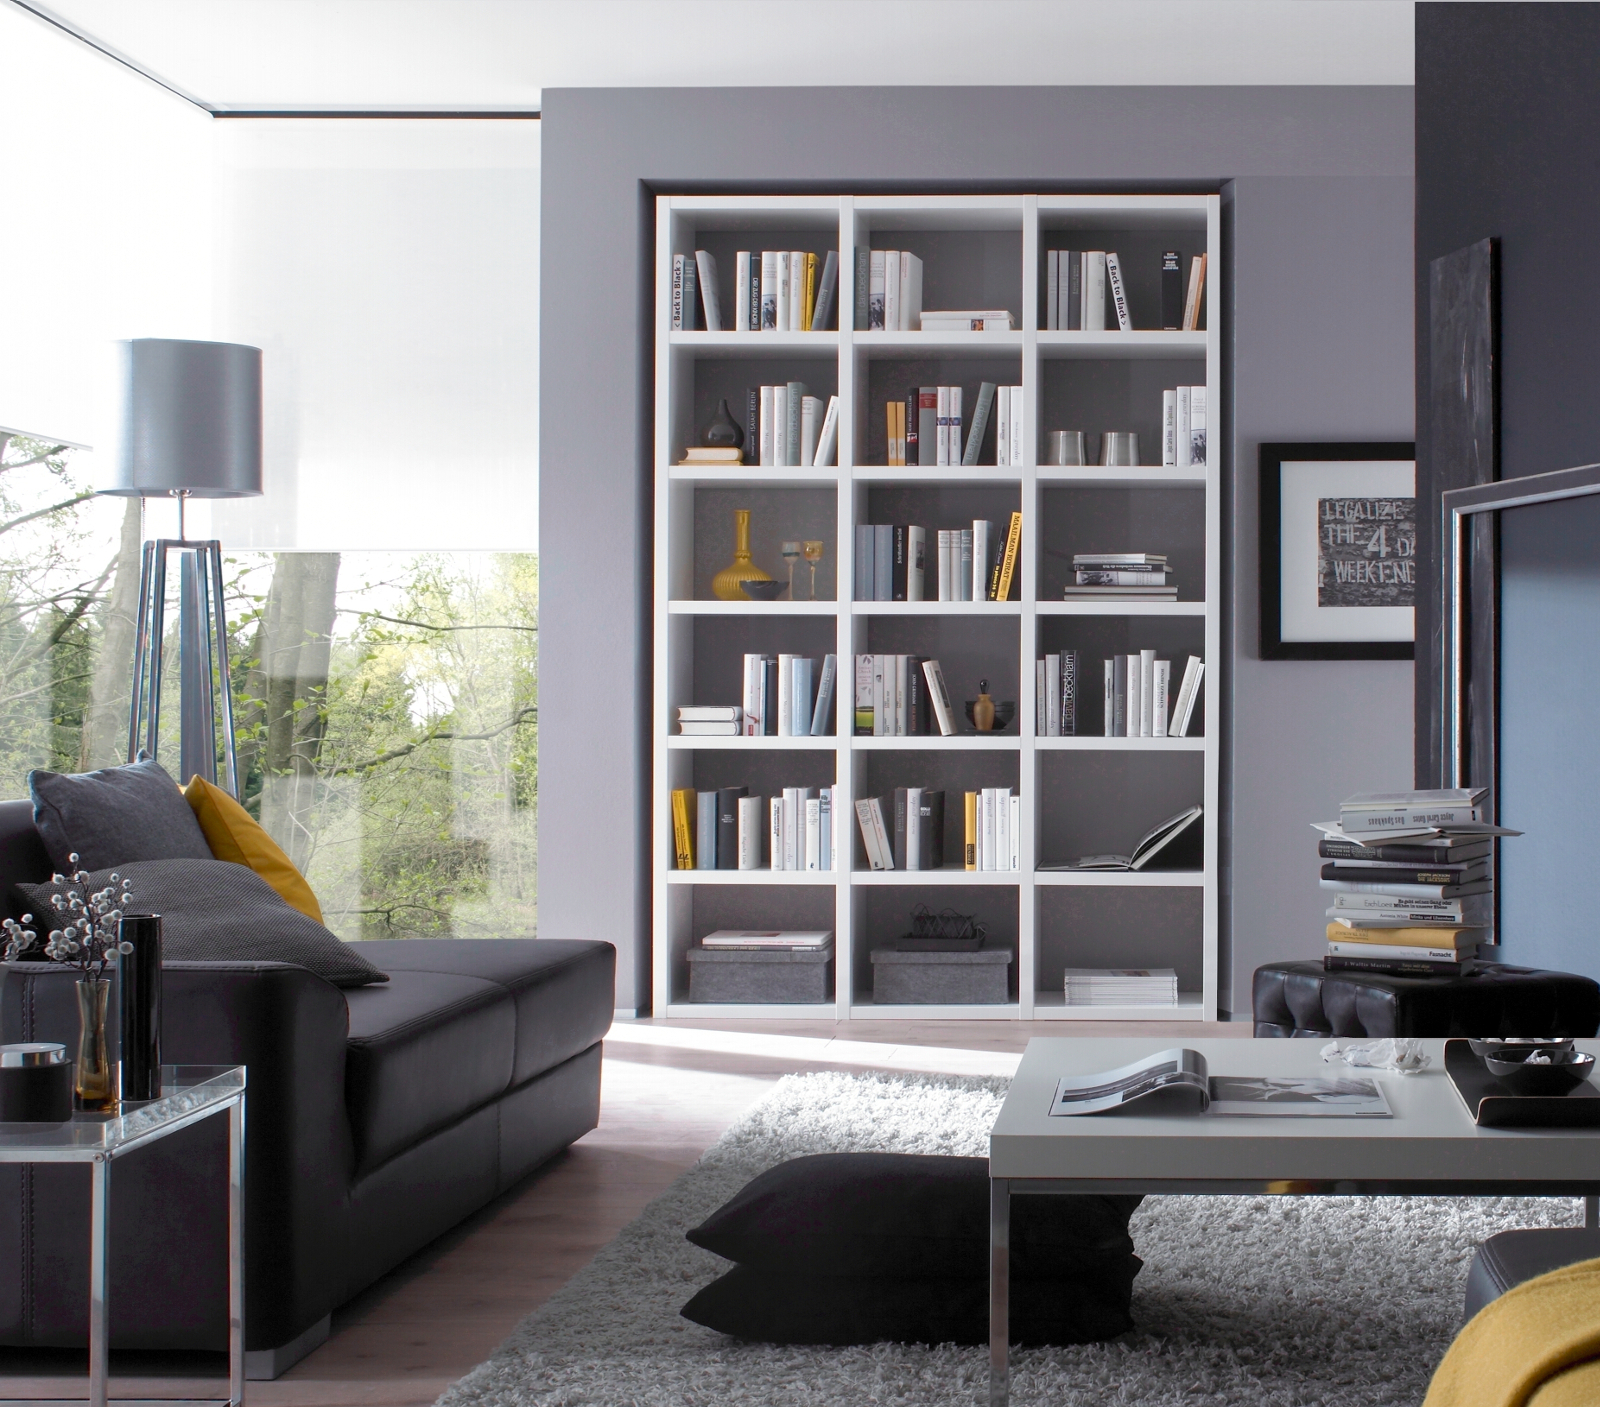 b cherwand bibliothek raumteiler wei hochglanz. Black Bedroom Furniture Sets. Home Design Ideas